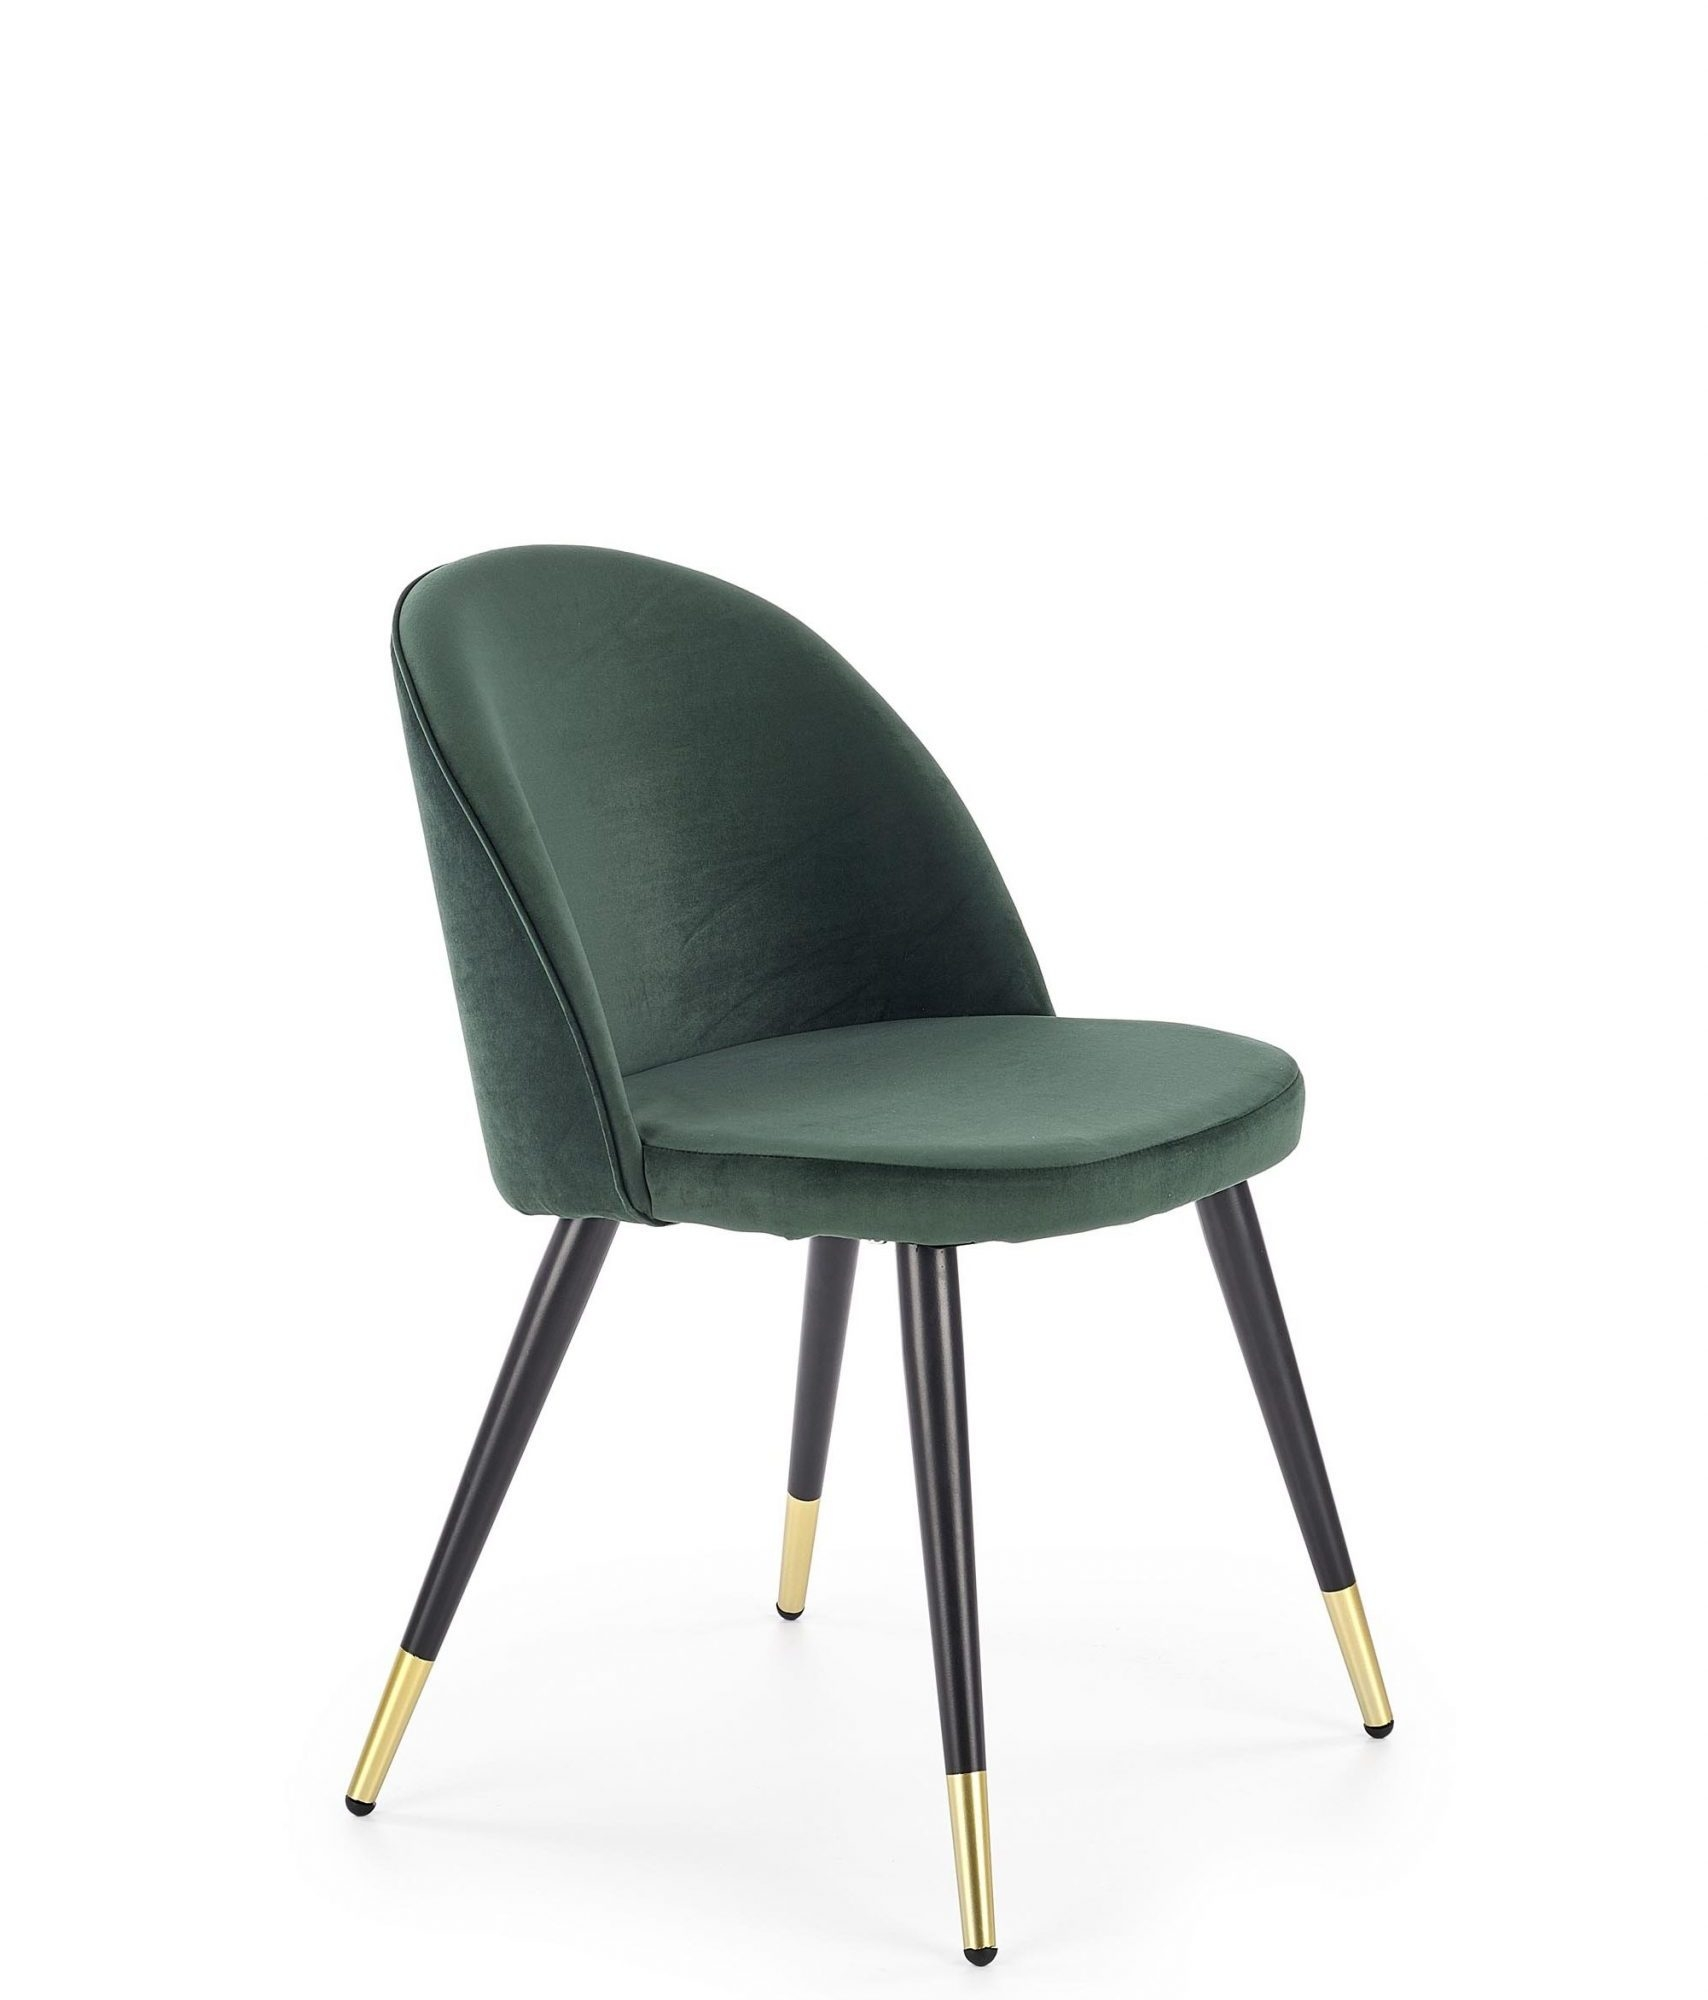 Scaun tapitat cu stofa, cu picioare metalice Claire Velvet Verde / Negru, l50xA55xH76 cm imagine